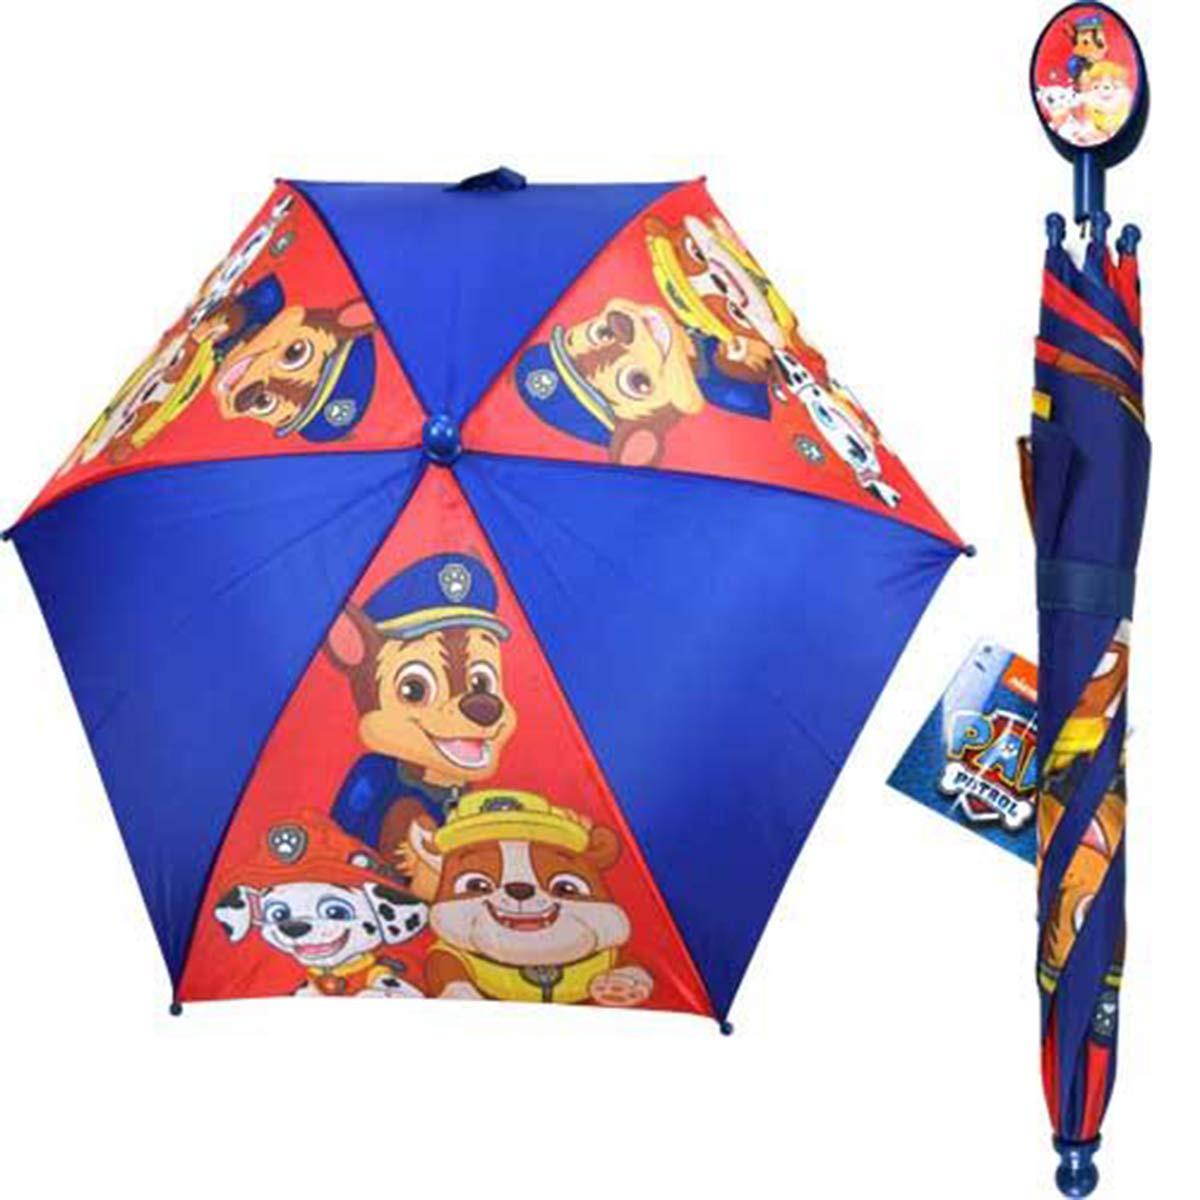 Umbrella Paw Patrol Blue Red Kids Youth 284208 2 Hobby Hunters